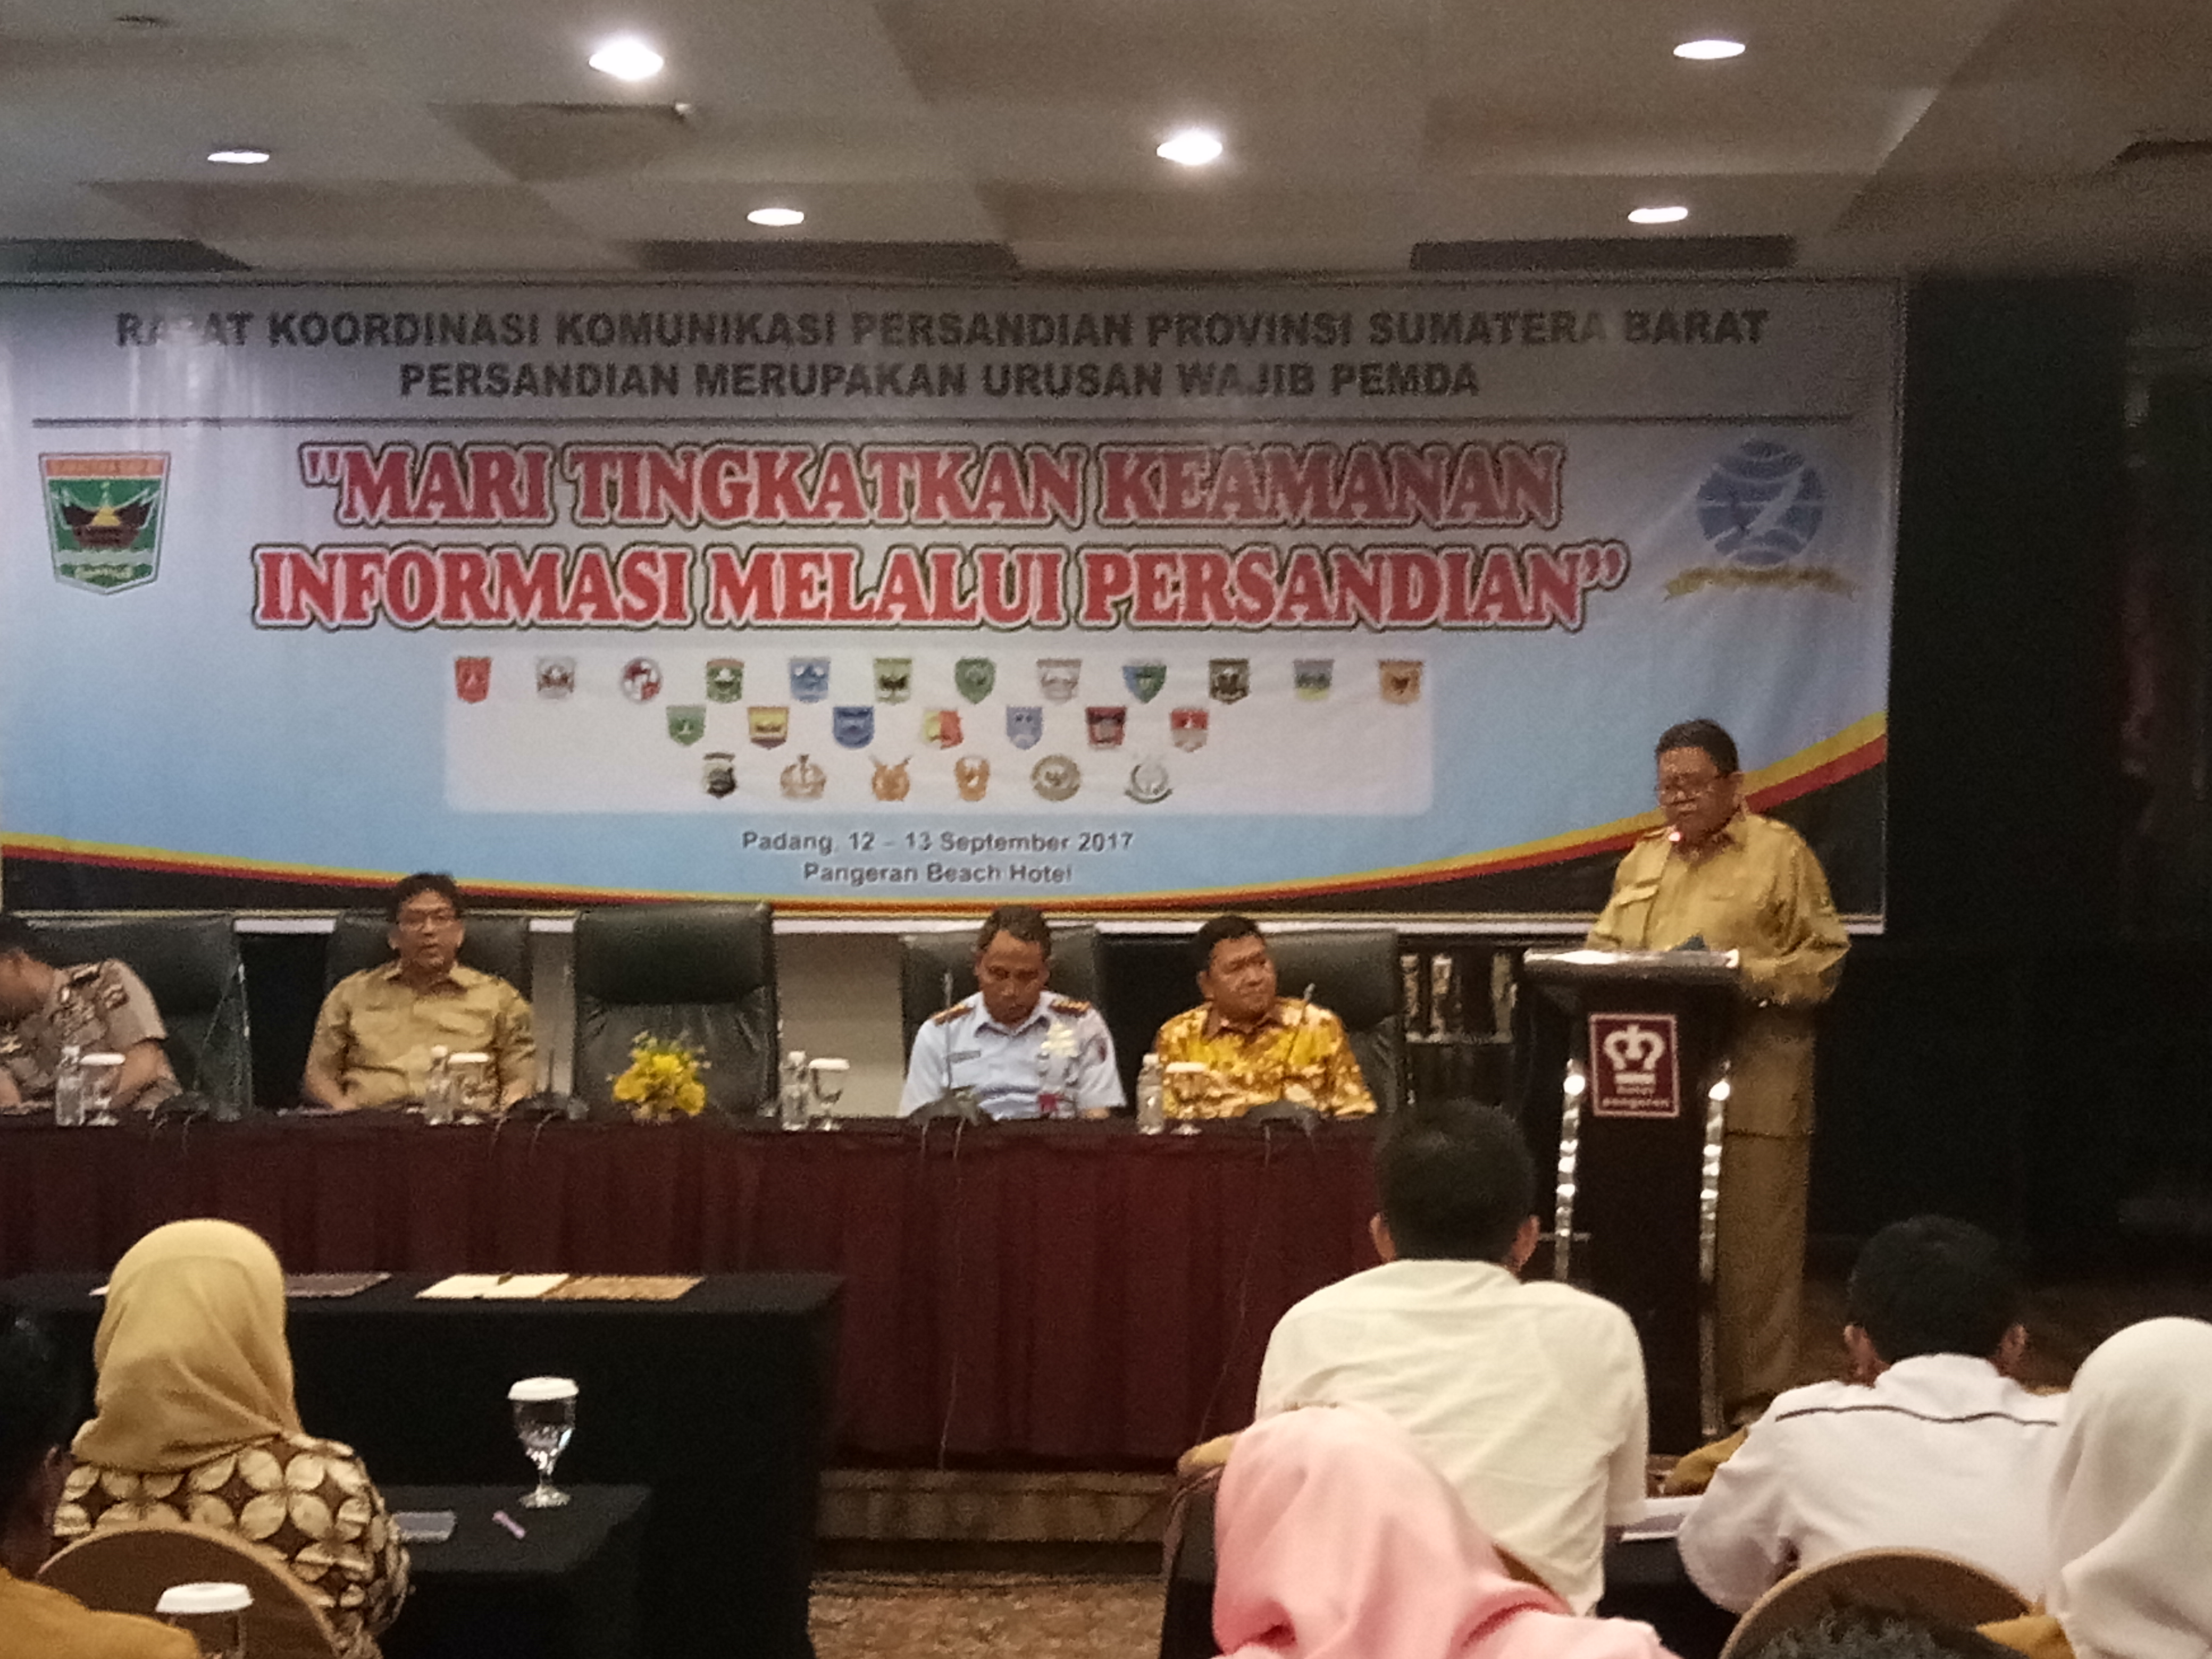 Rapat Koordinasi Komunikasi Persandian Provinsi Sumatera Barat Tahun 2017